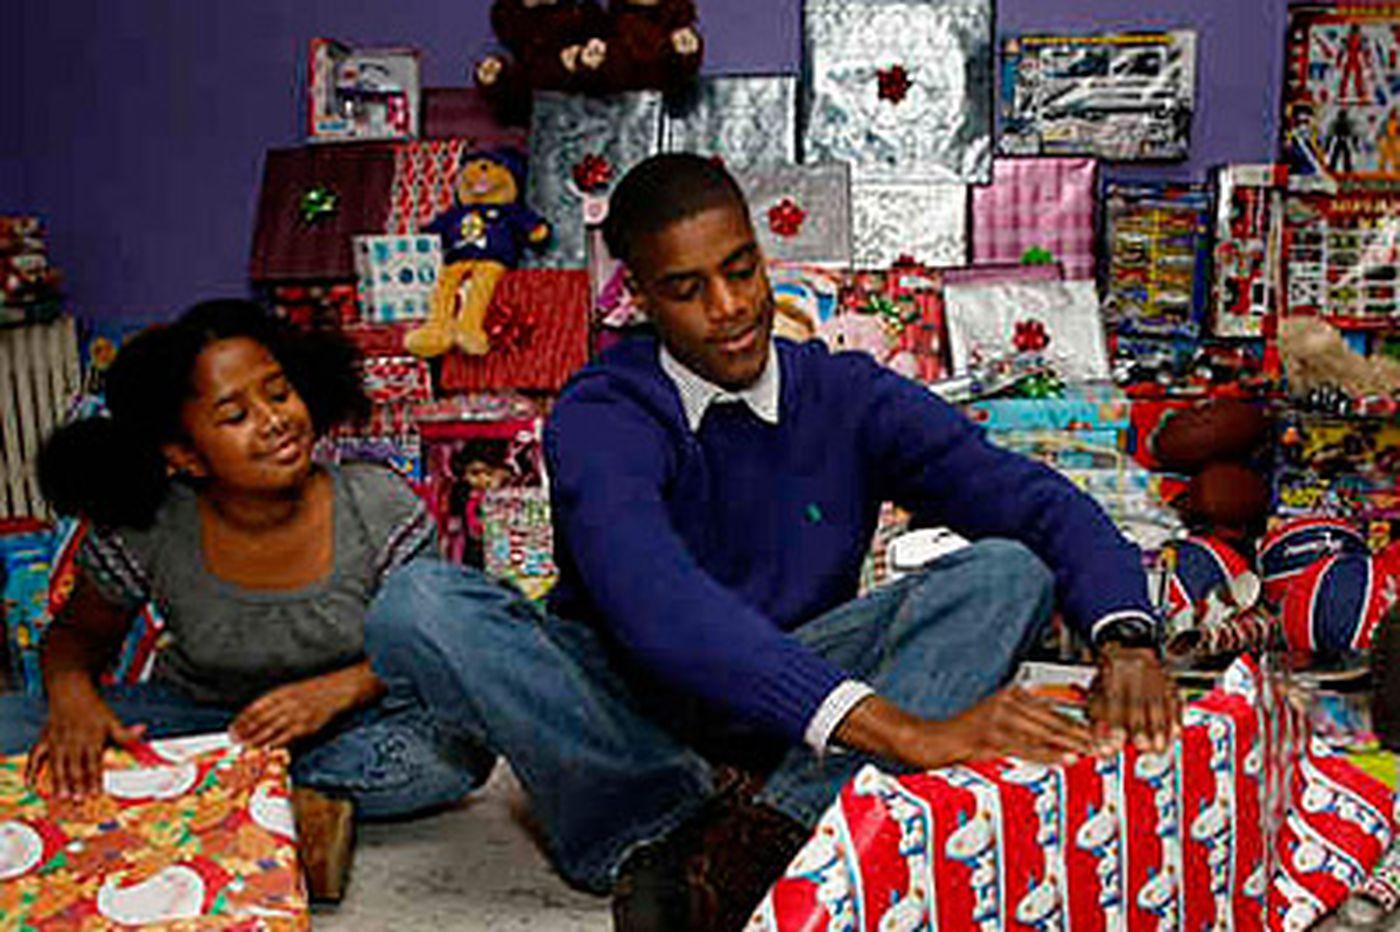 Young Overbrook entrepreneur turns junk into joy